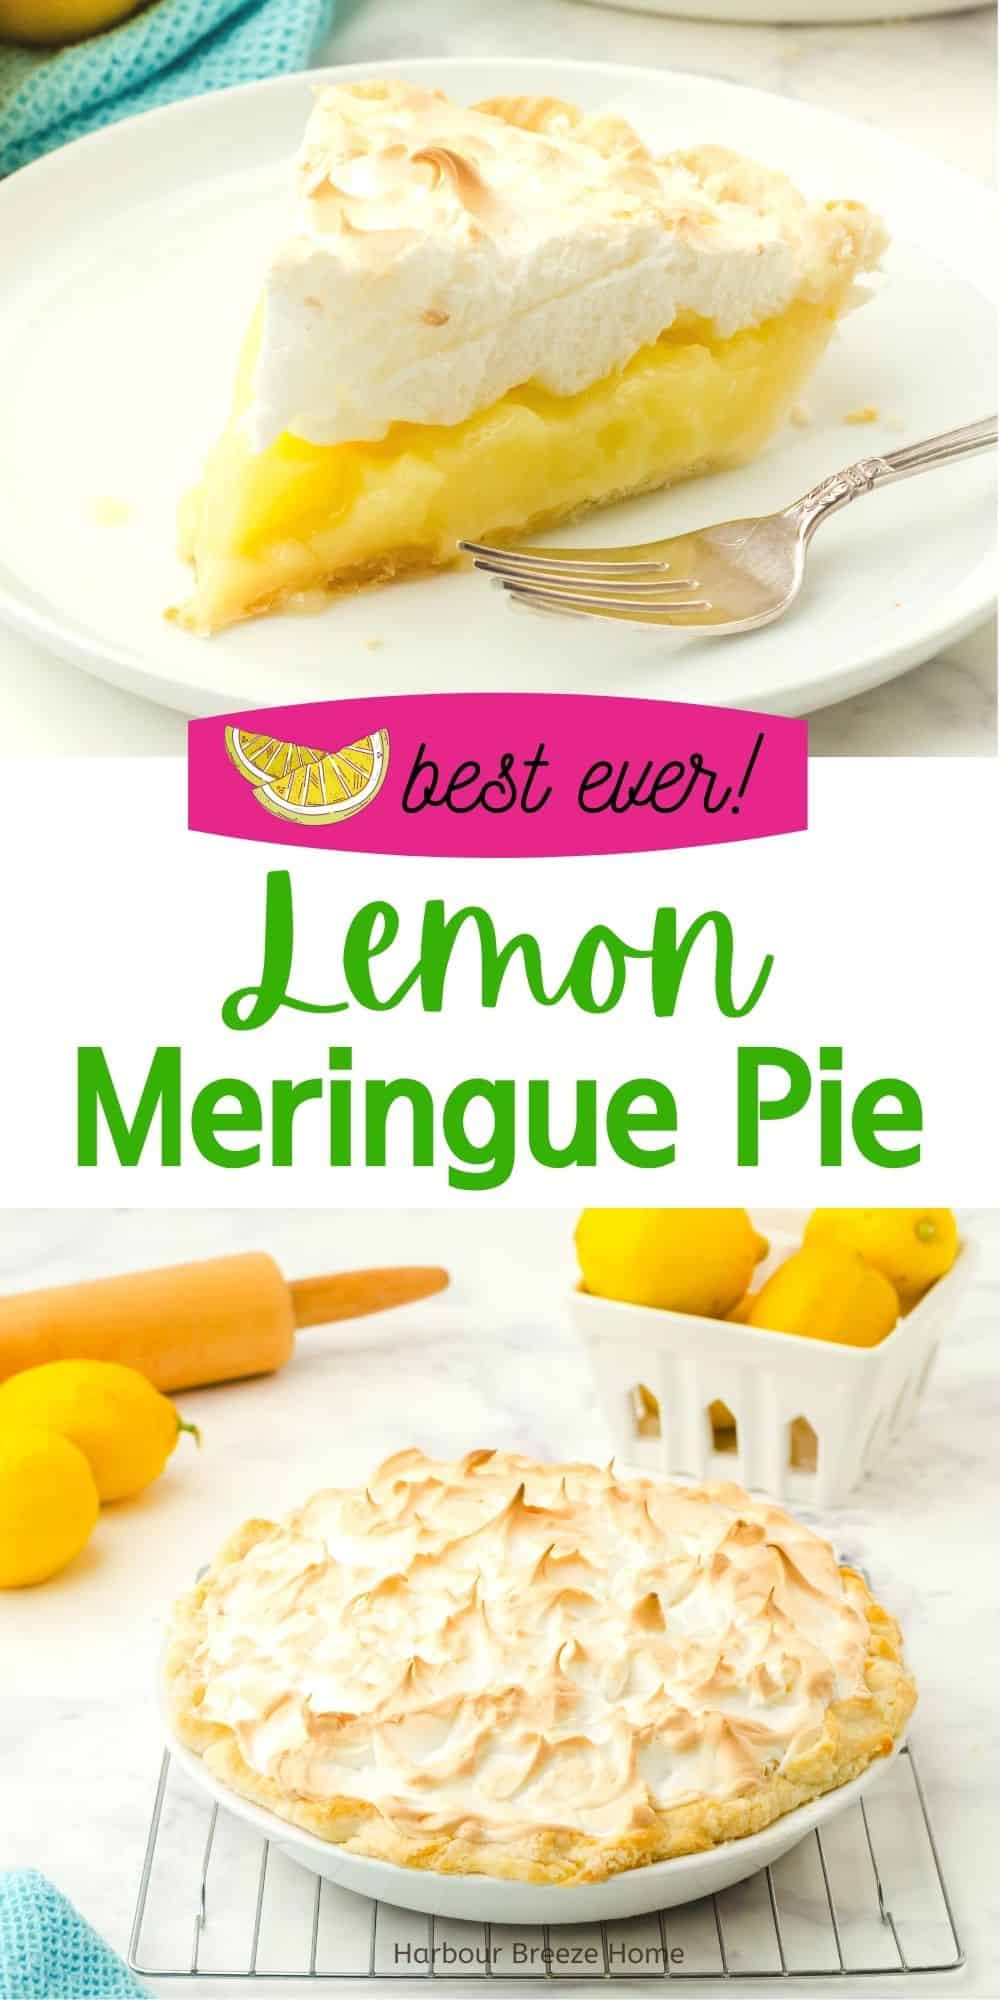 How to make the best ever Lemon Meringue Pie